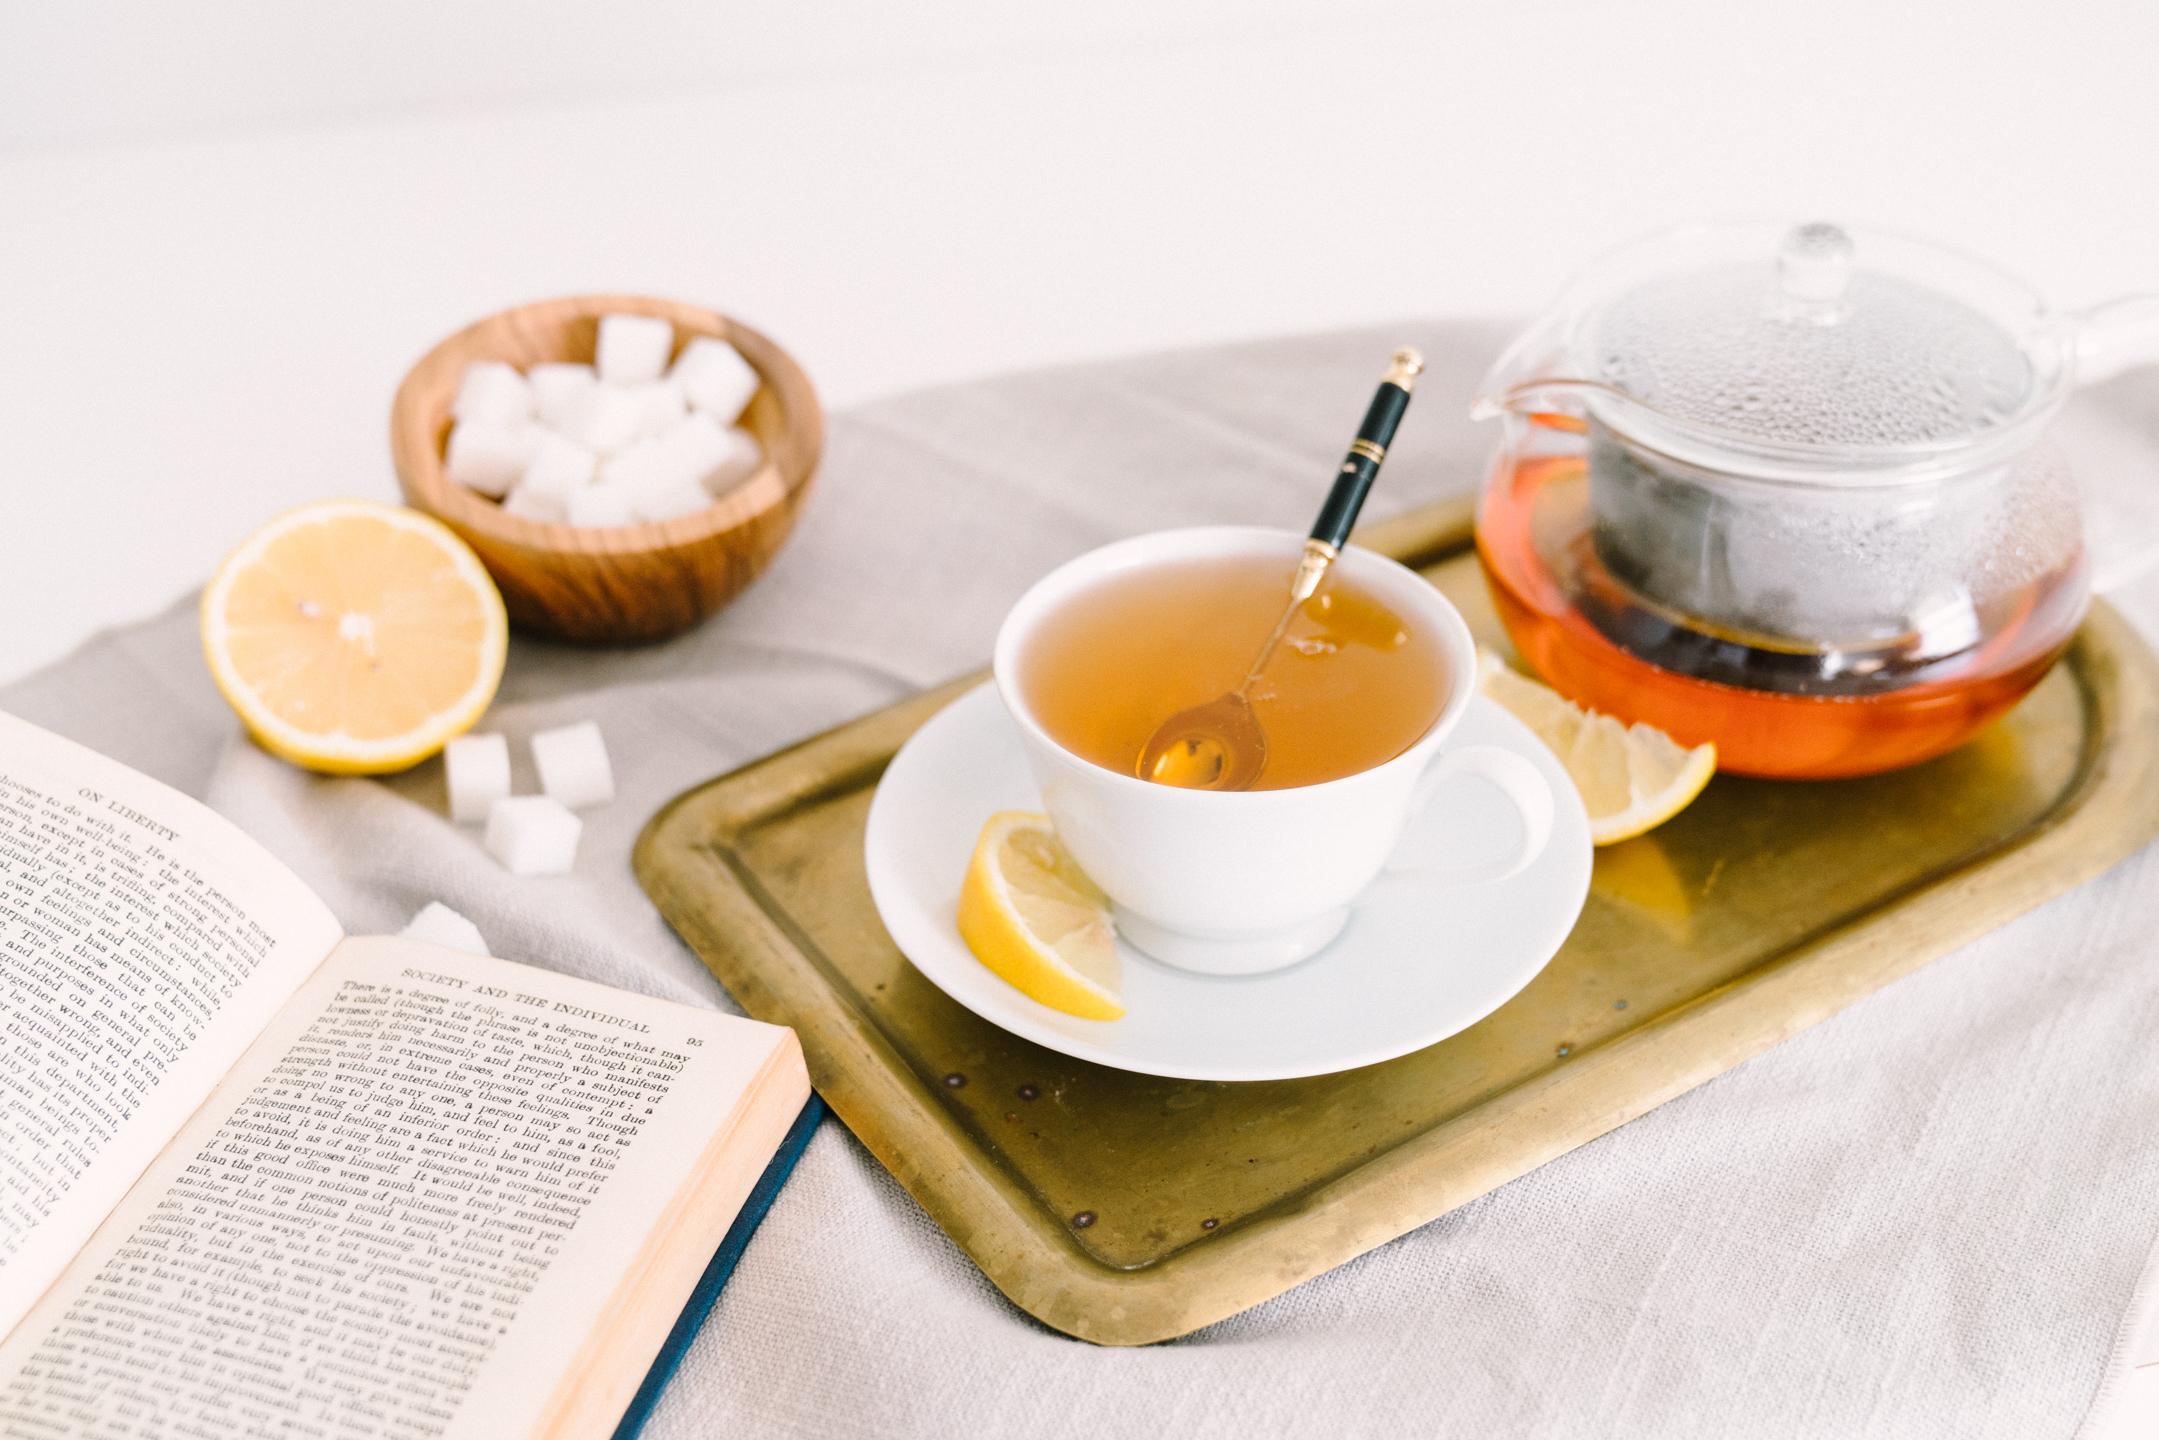 national hot tea day: wellness challenge healthier drinks